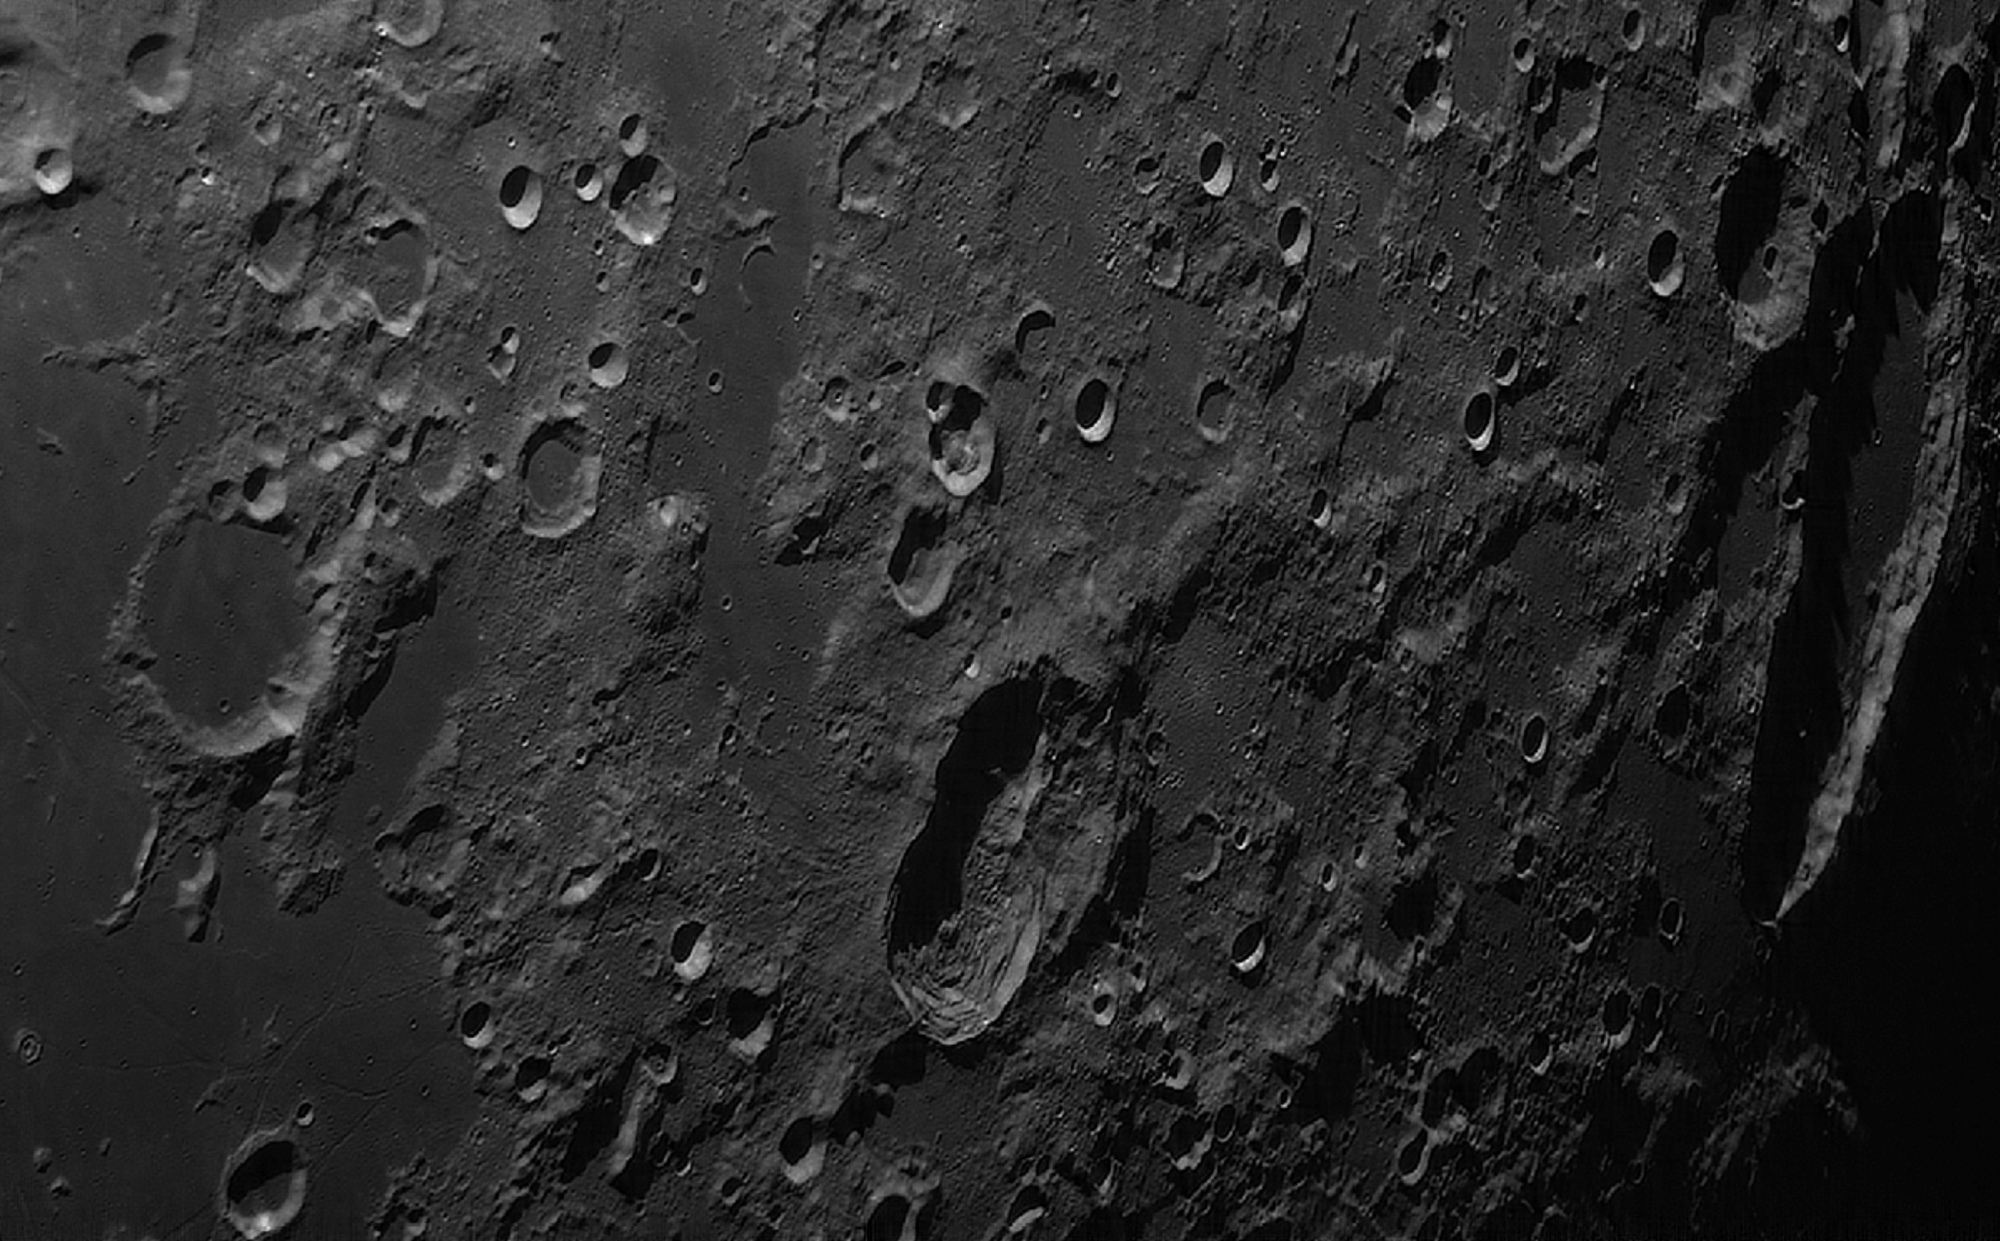 5c6aa7ea54eda_lune4.thumb.jpg.d37f761447310f43113aa215c0a22cc8.jpg